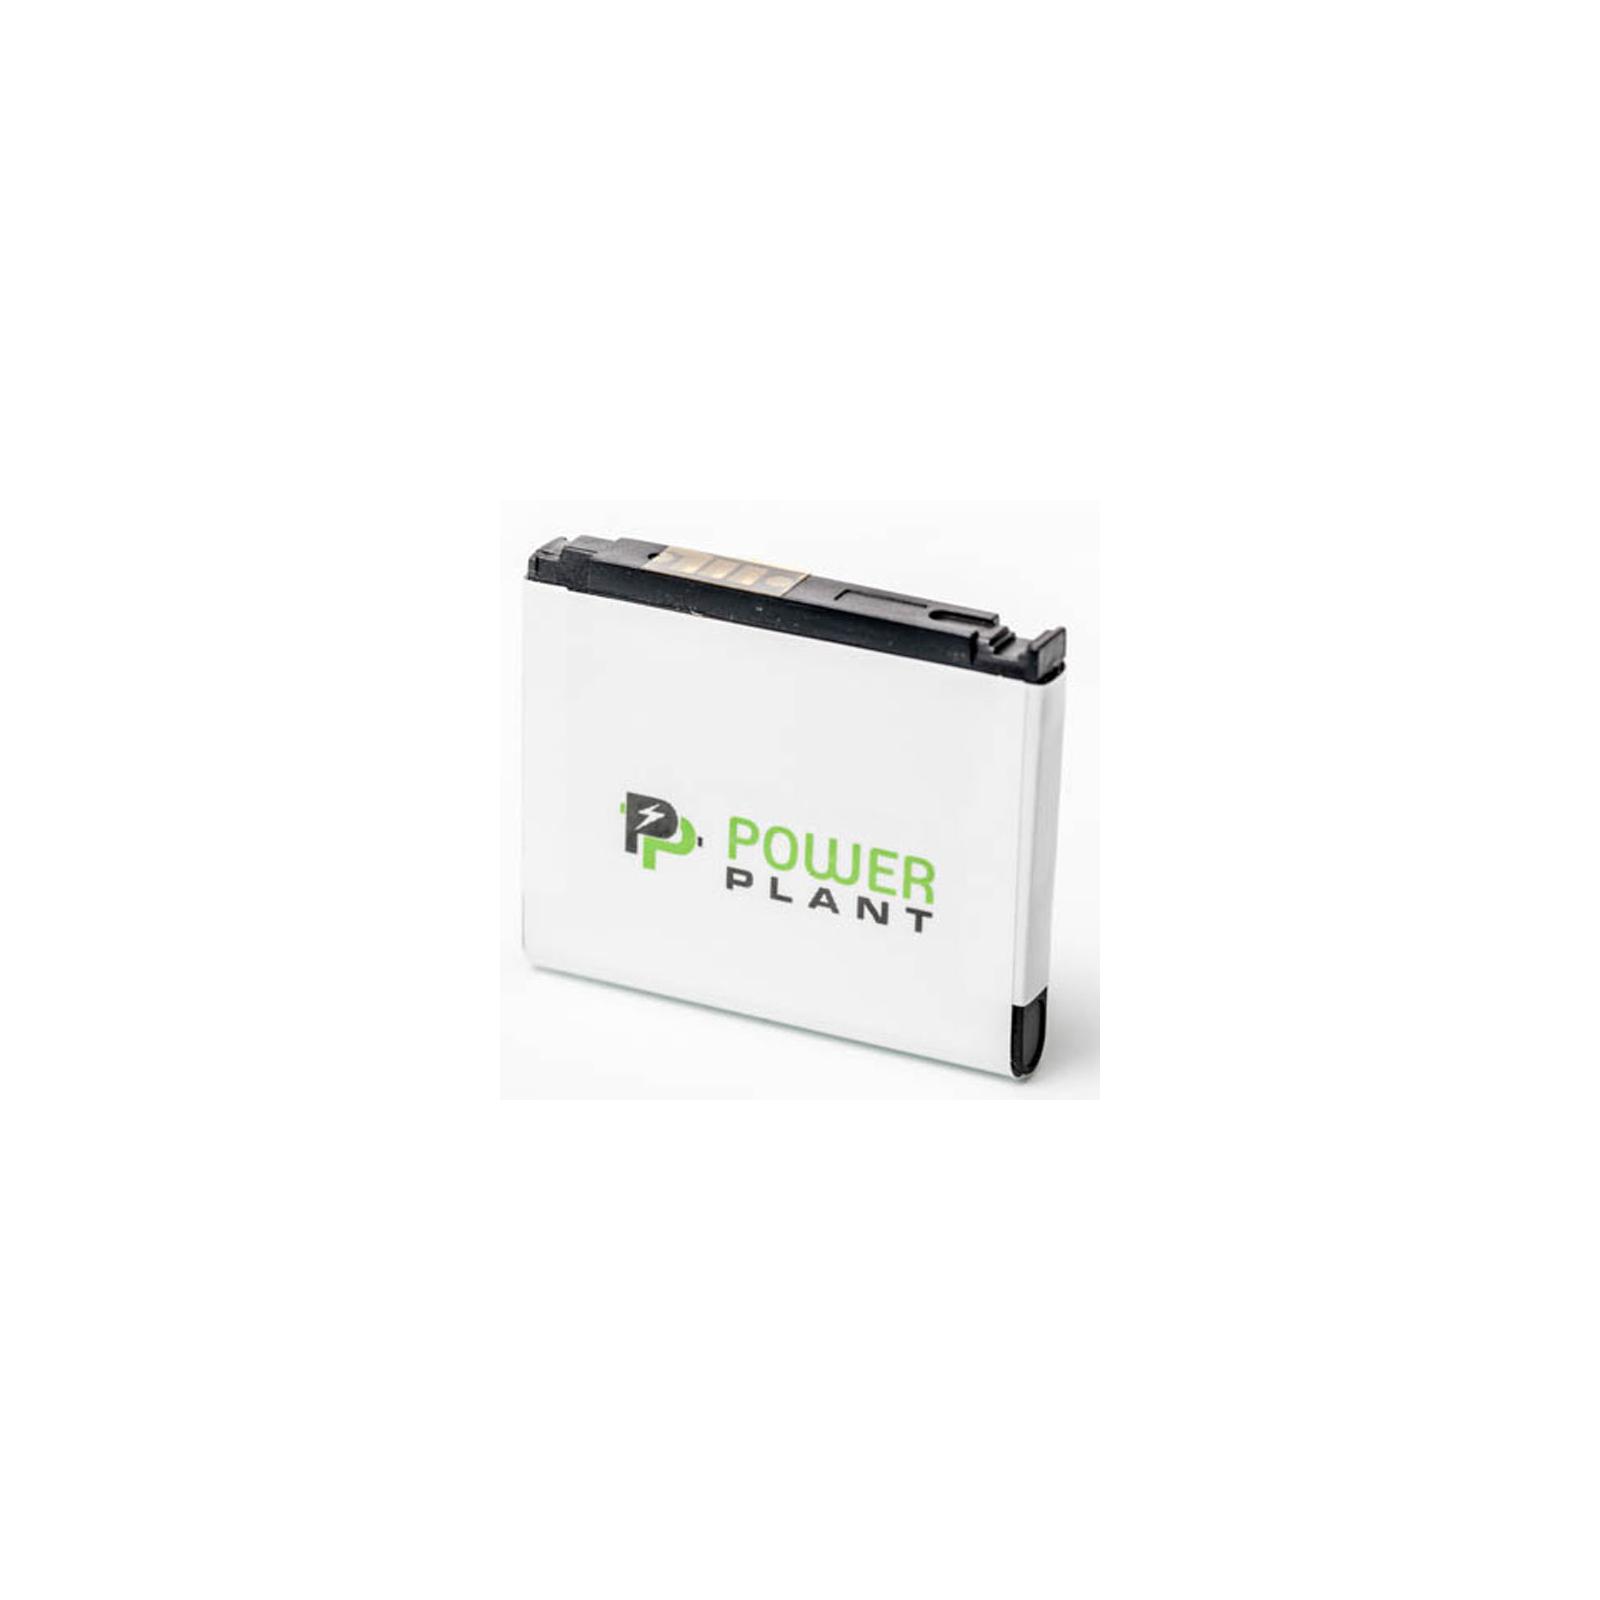 Аккумуляторная батарея PowerPlant Samsung U708 (U708/U700) (DV00DV6170) изображение 2